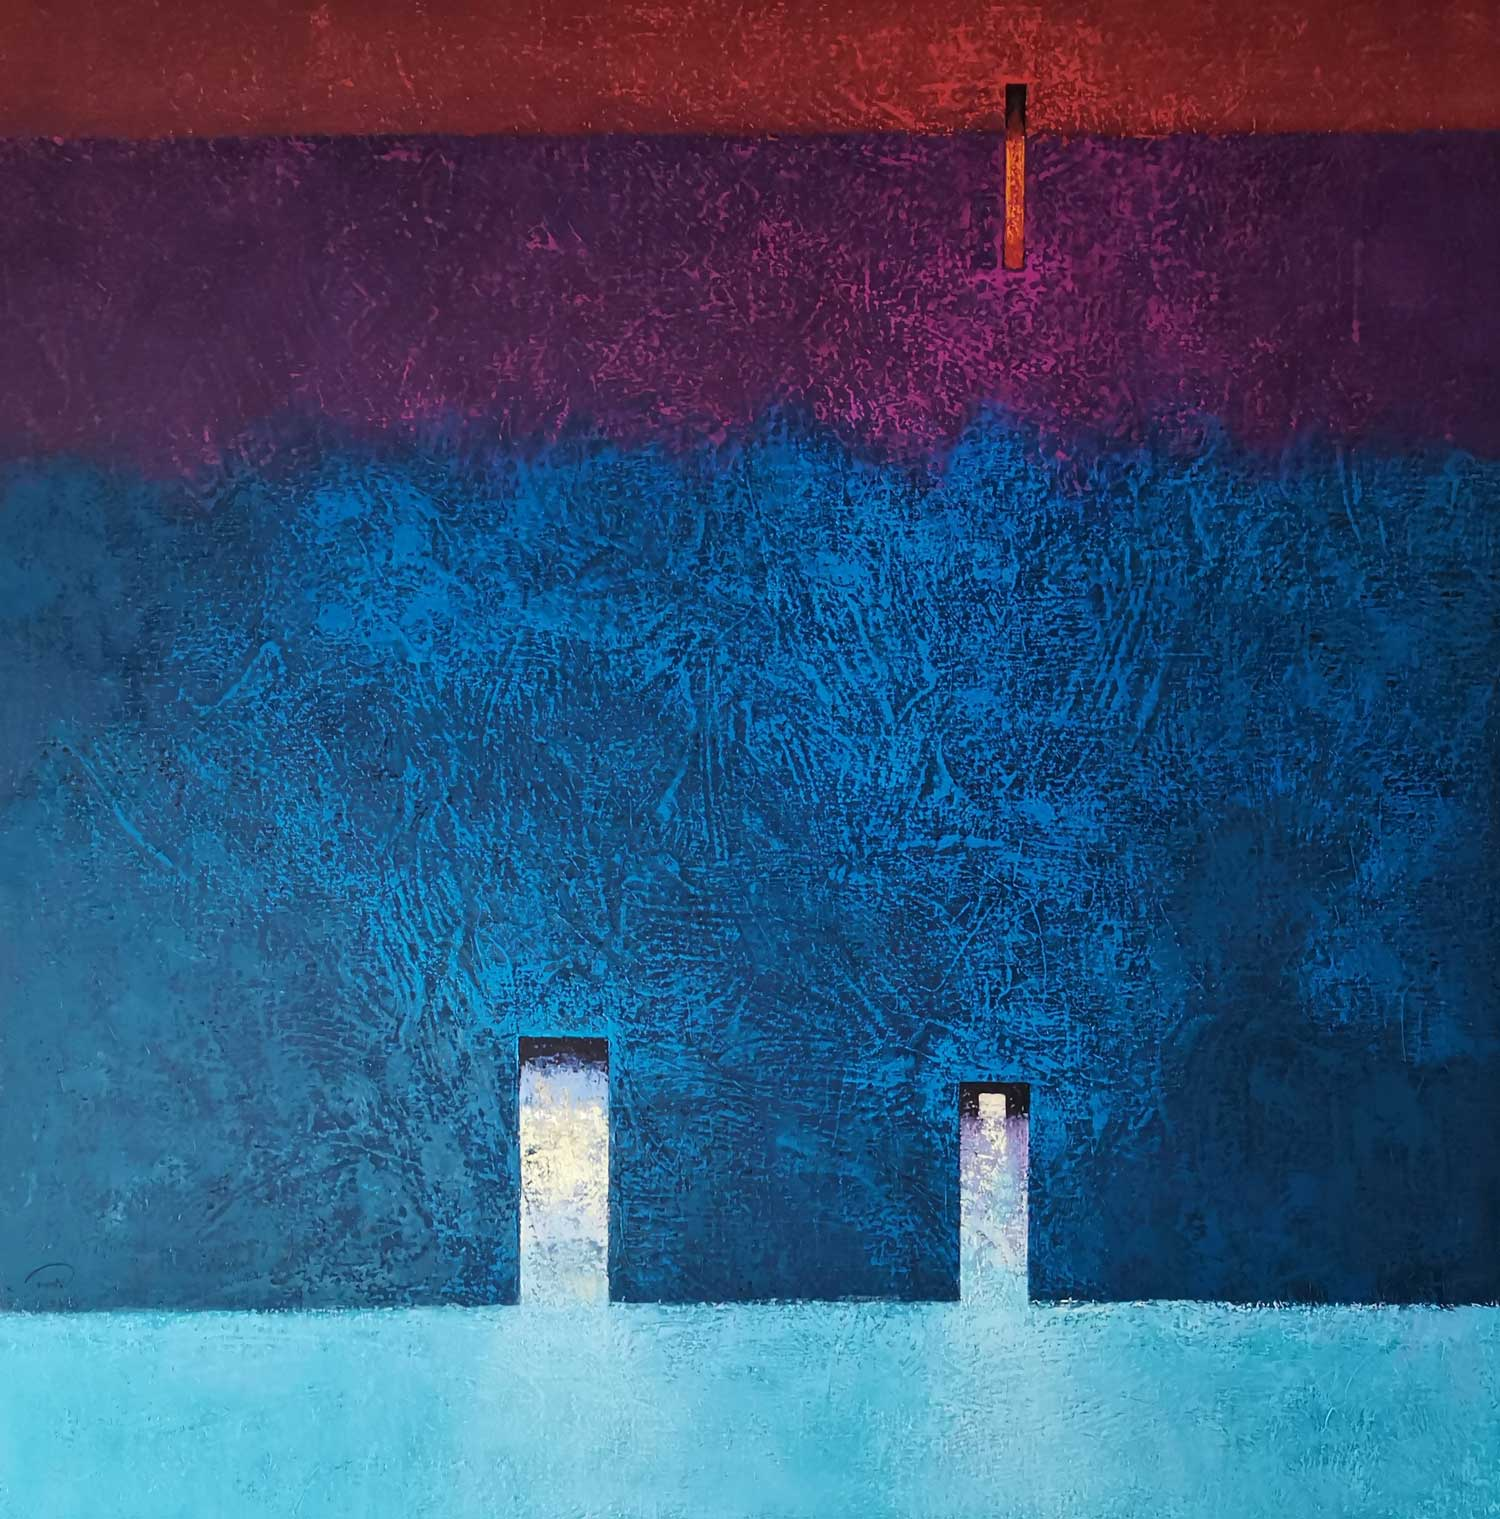 galeria-de-arte-barcelona-sant-cugat-cuadros-pintura